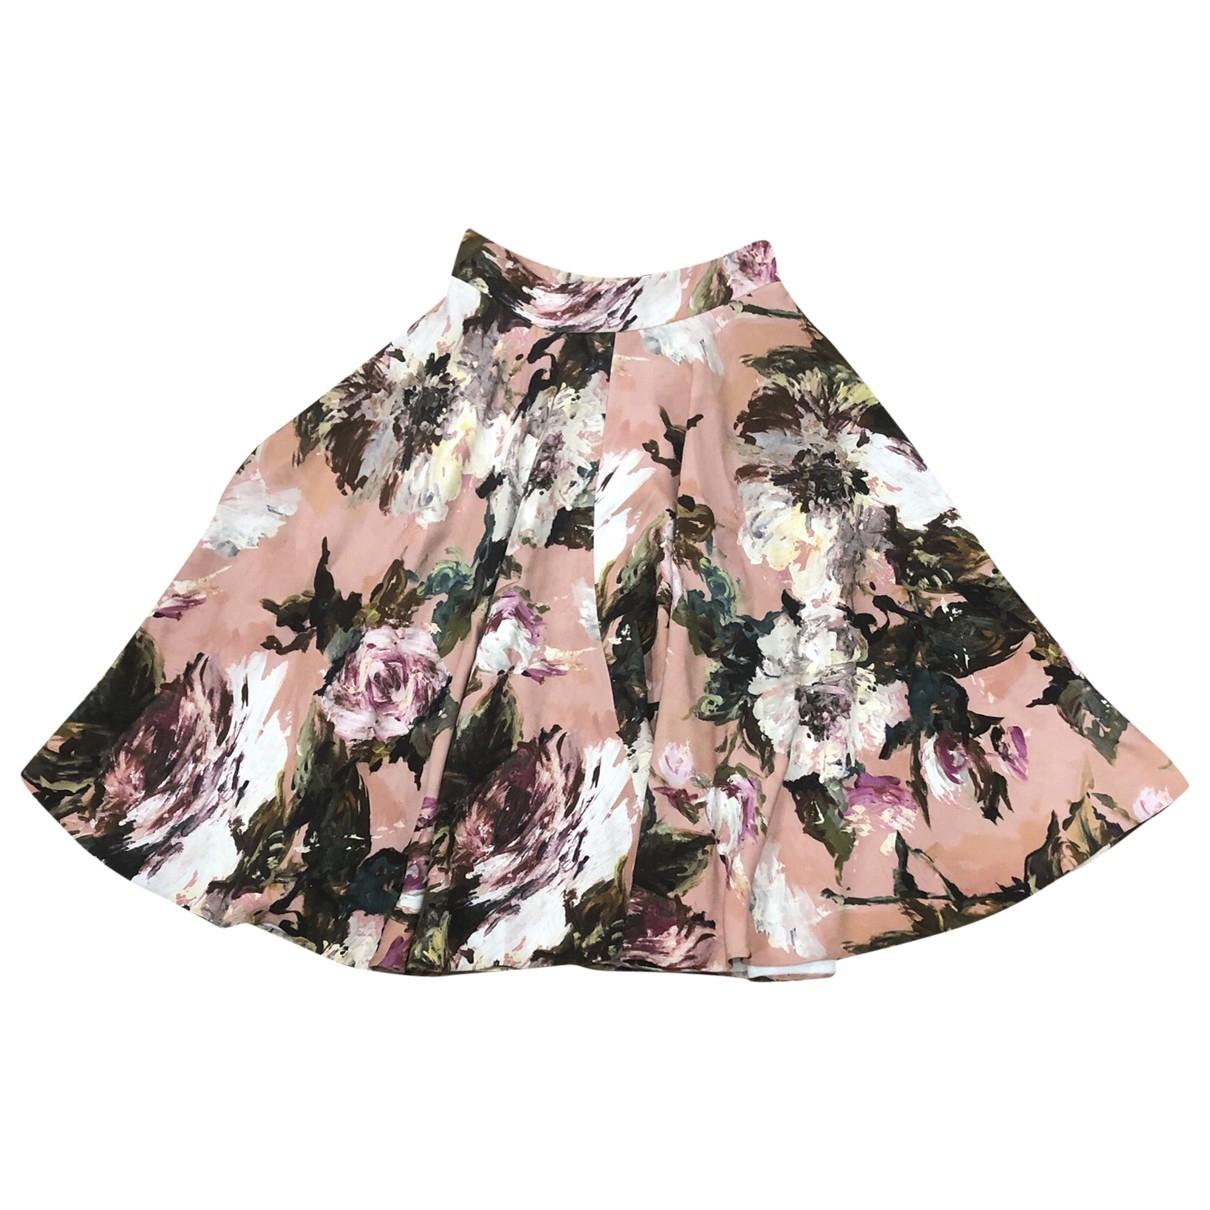 Dolce & Gabbana - Jupe   pour femme - rose